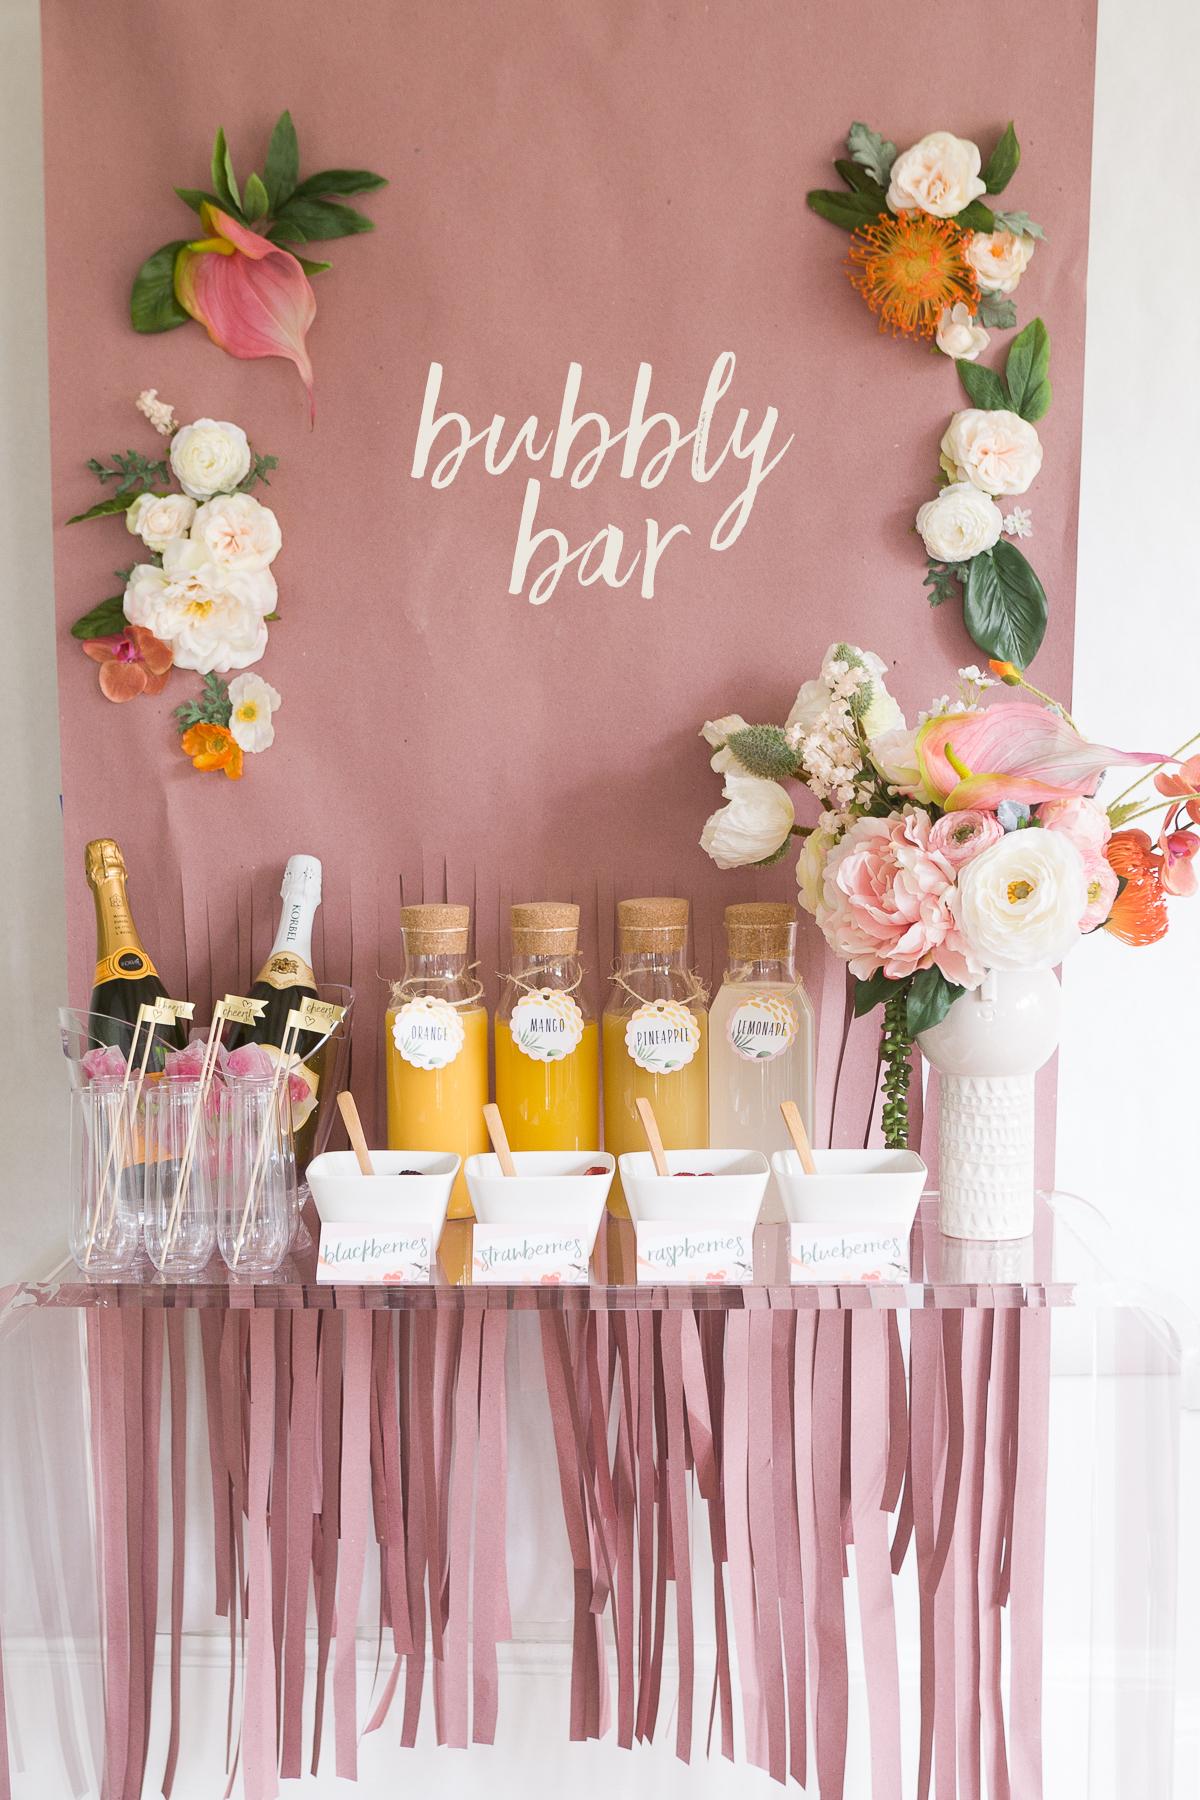 Bridal Shower Brunch Ideas -  Mimosa Bar!